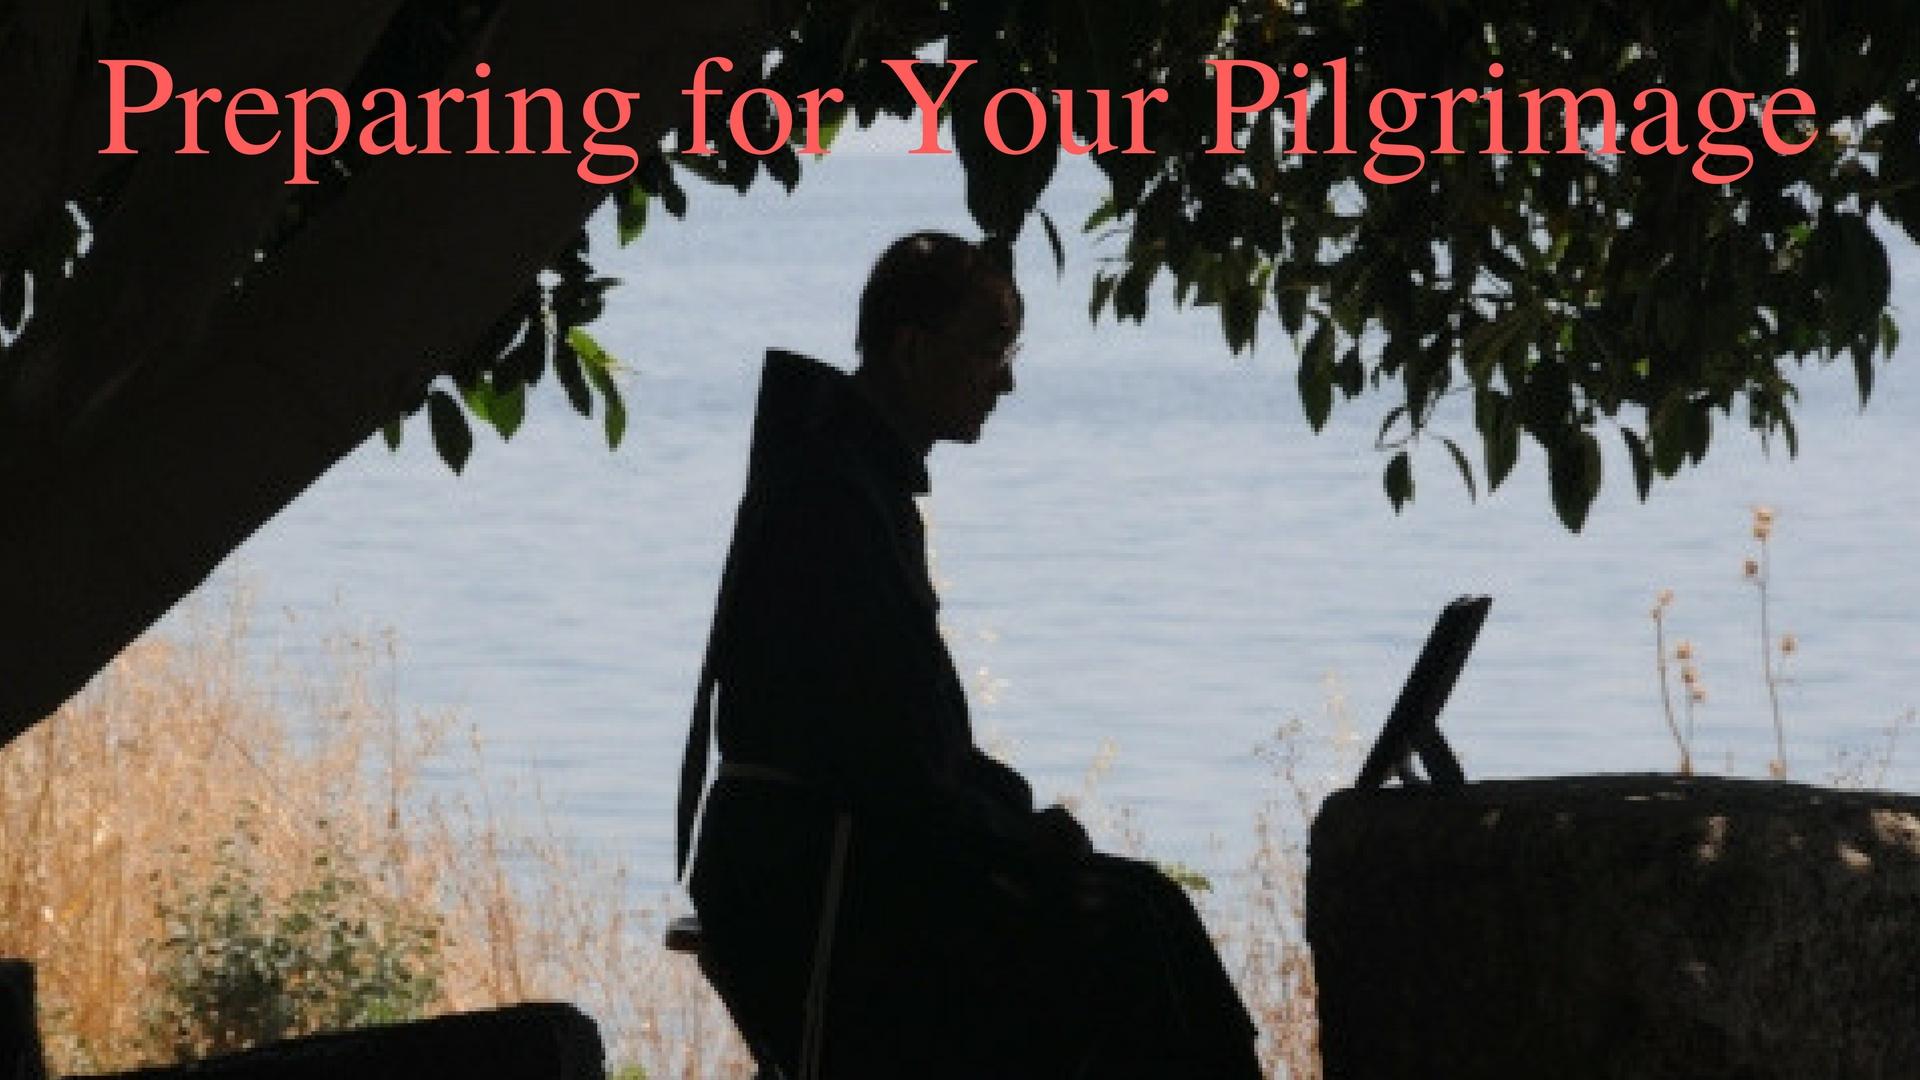 Preparing for Your Pilgrimage (1).jpg